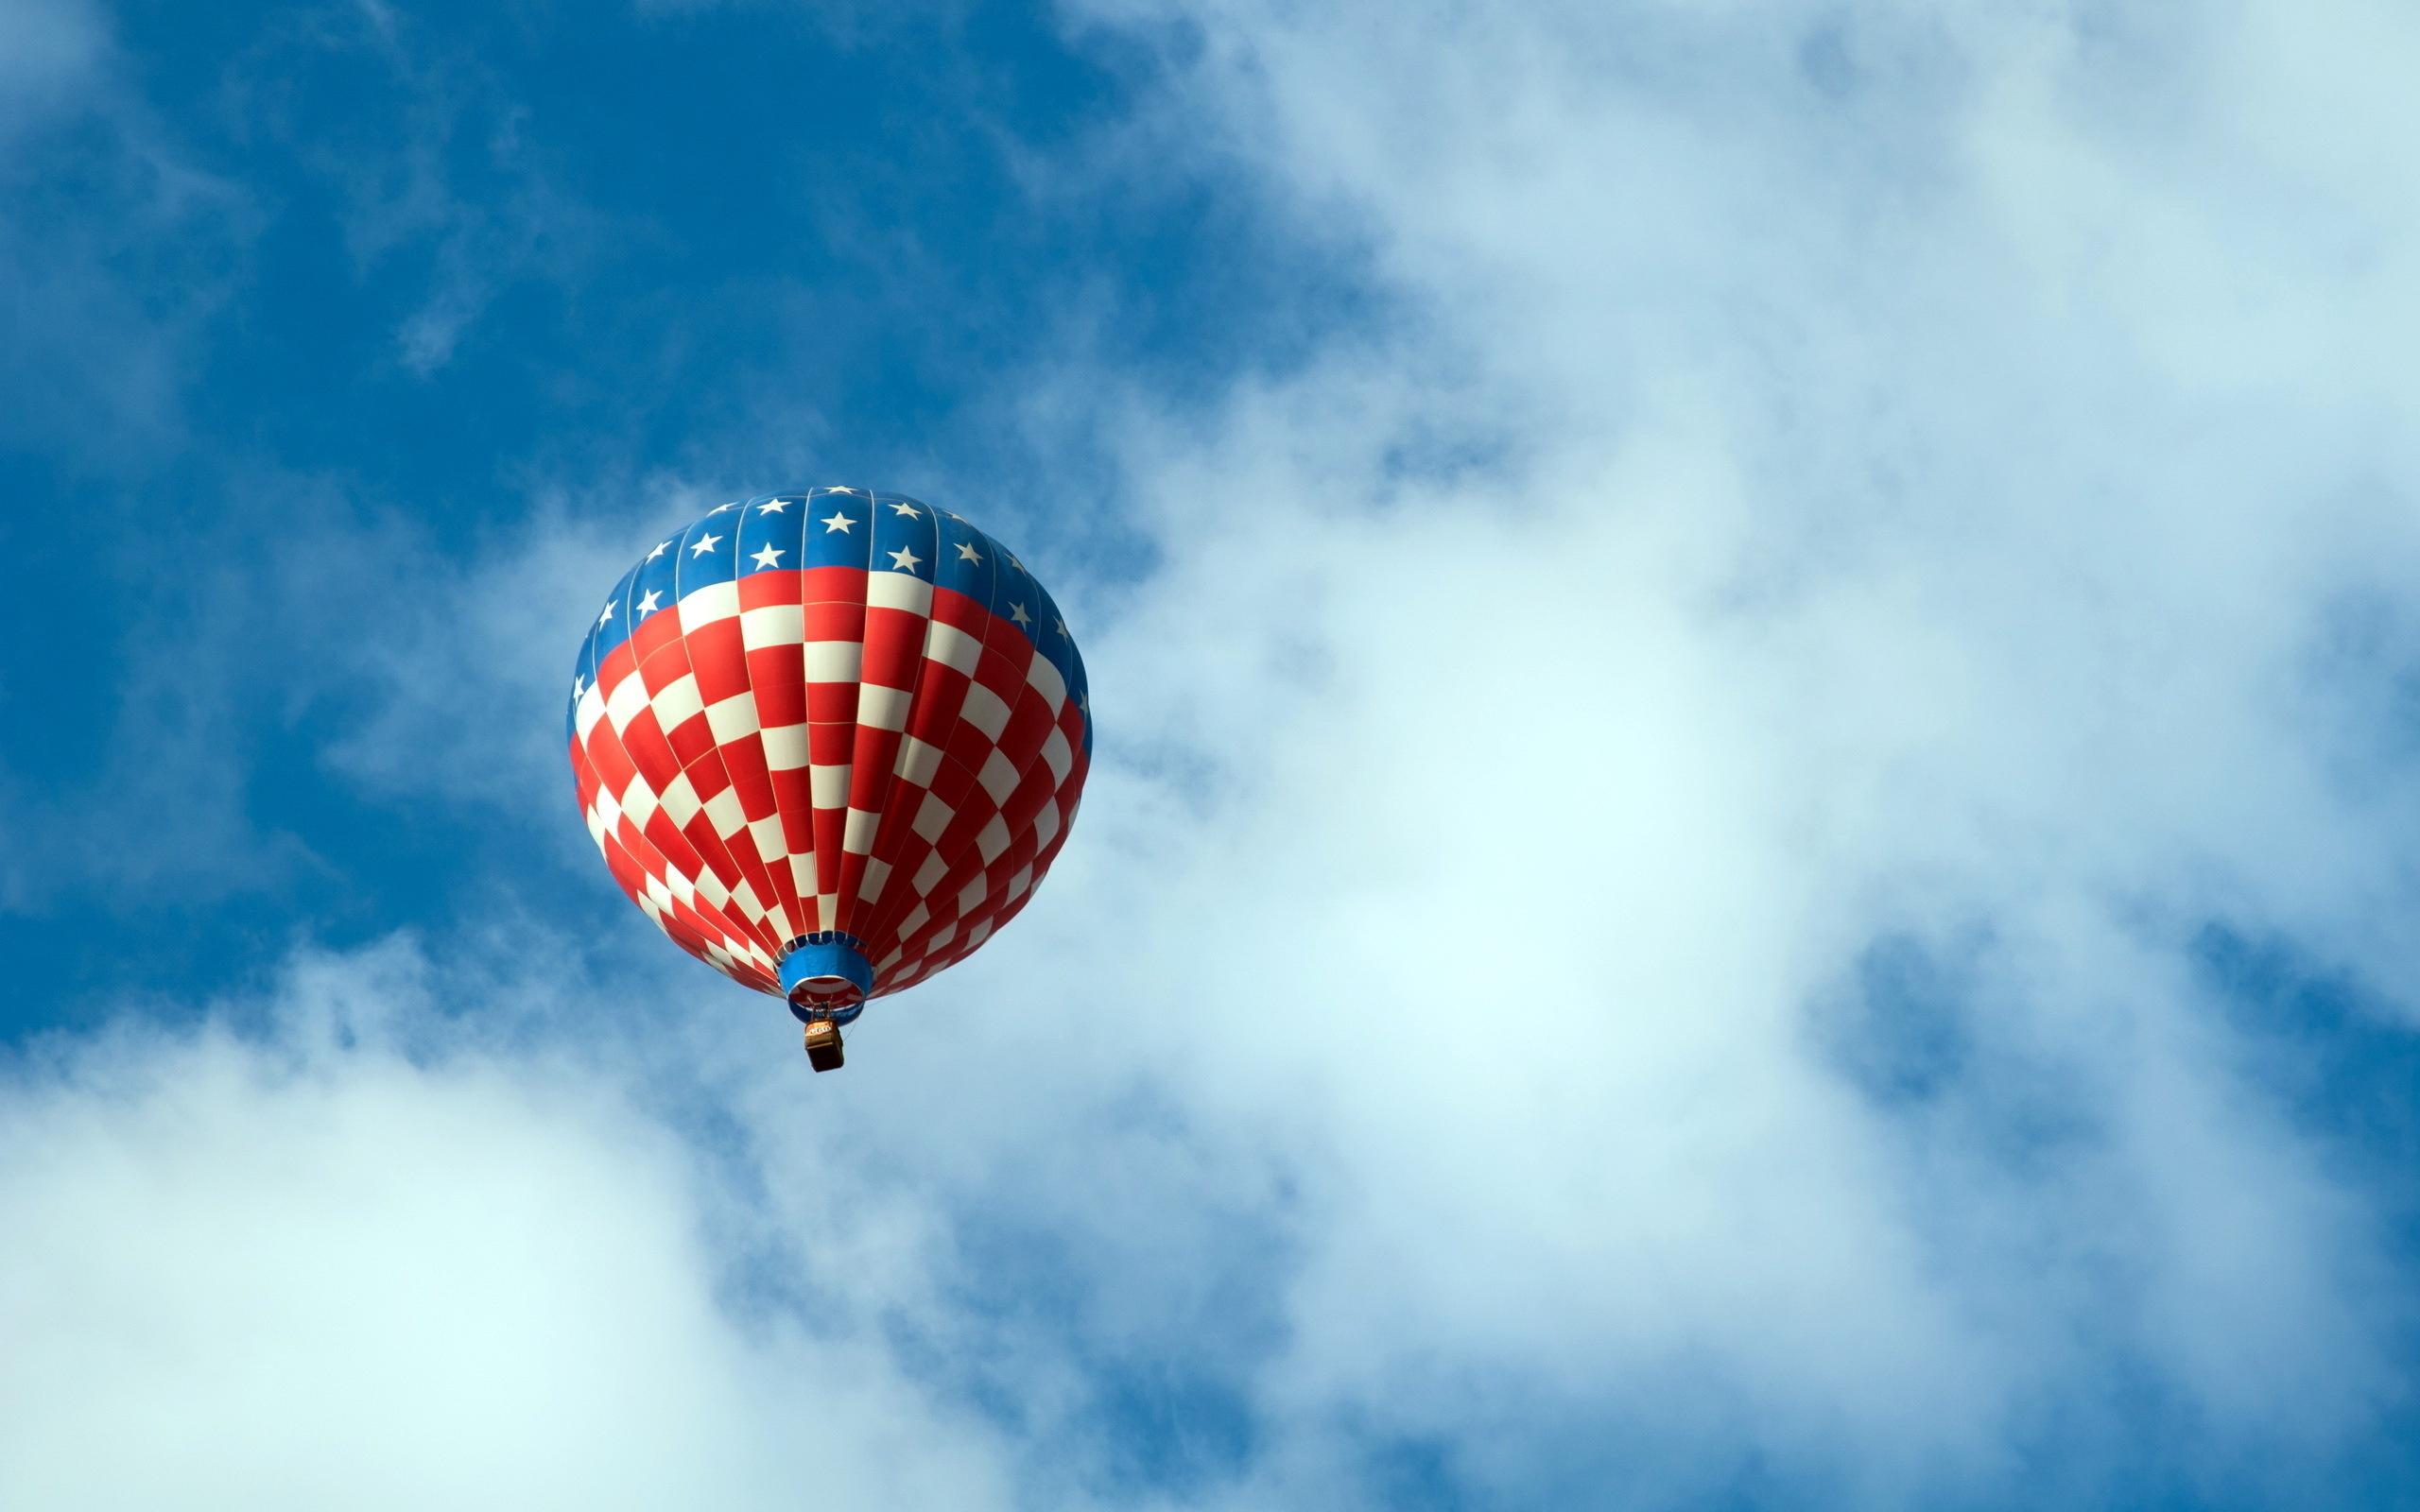 21 Wonderful HD Hot Air Balloon Wallpapers   HDWallSourcecom 2560x1600